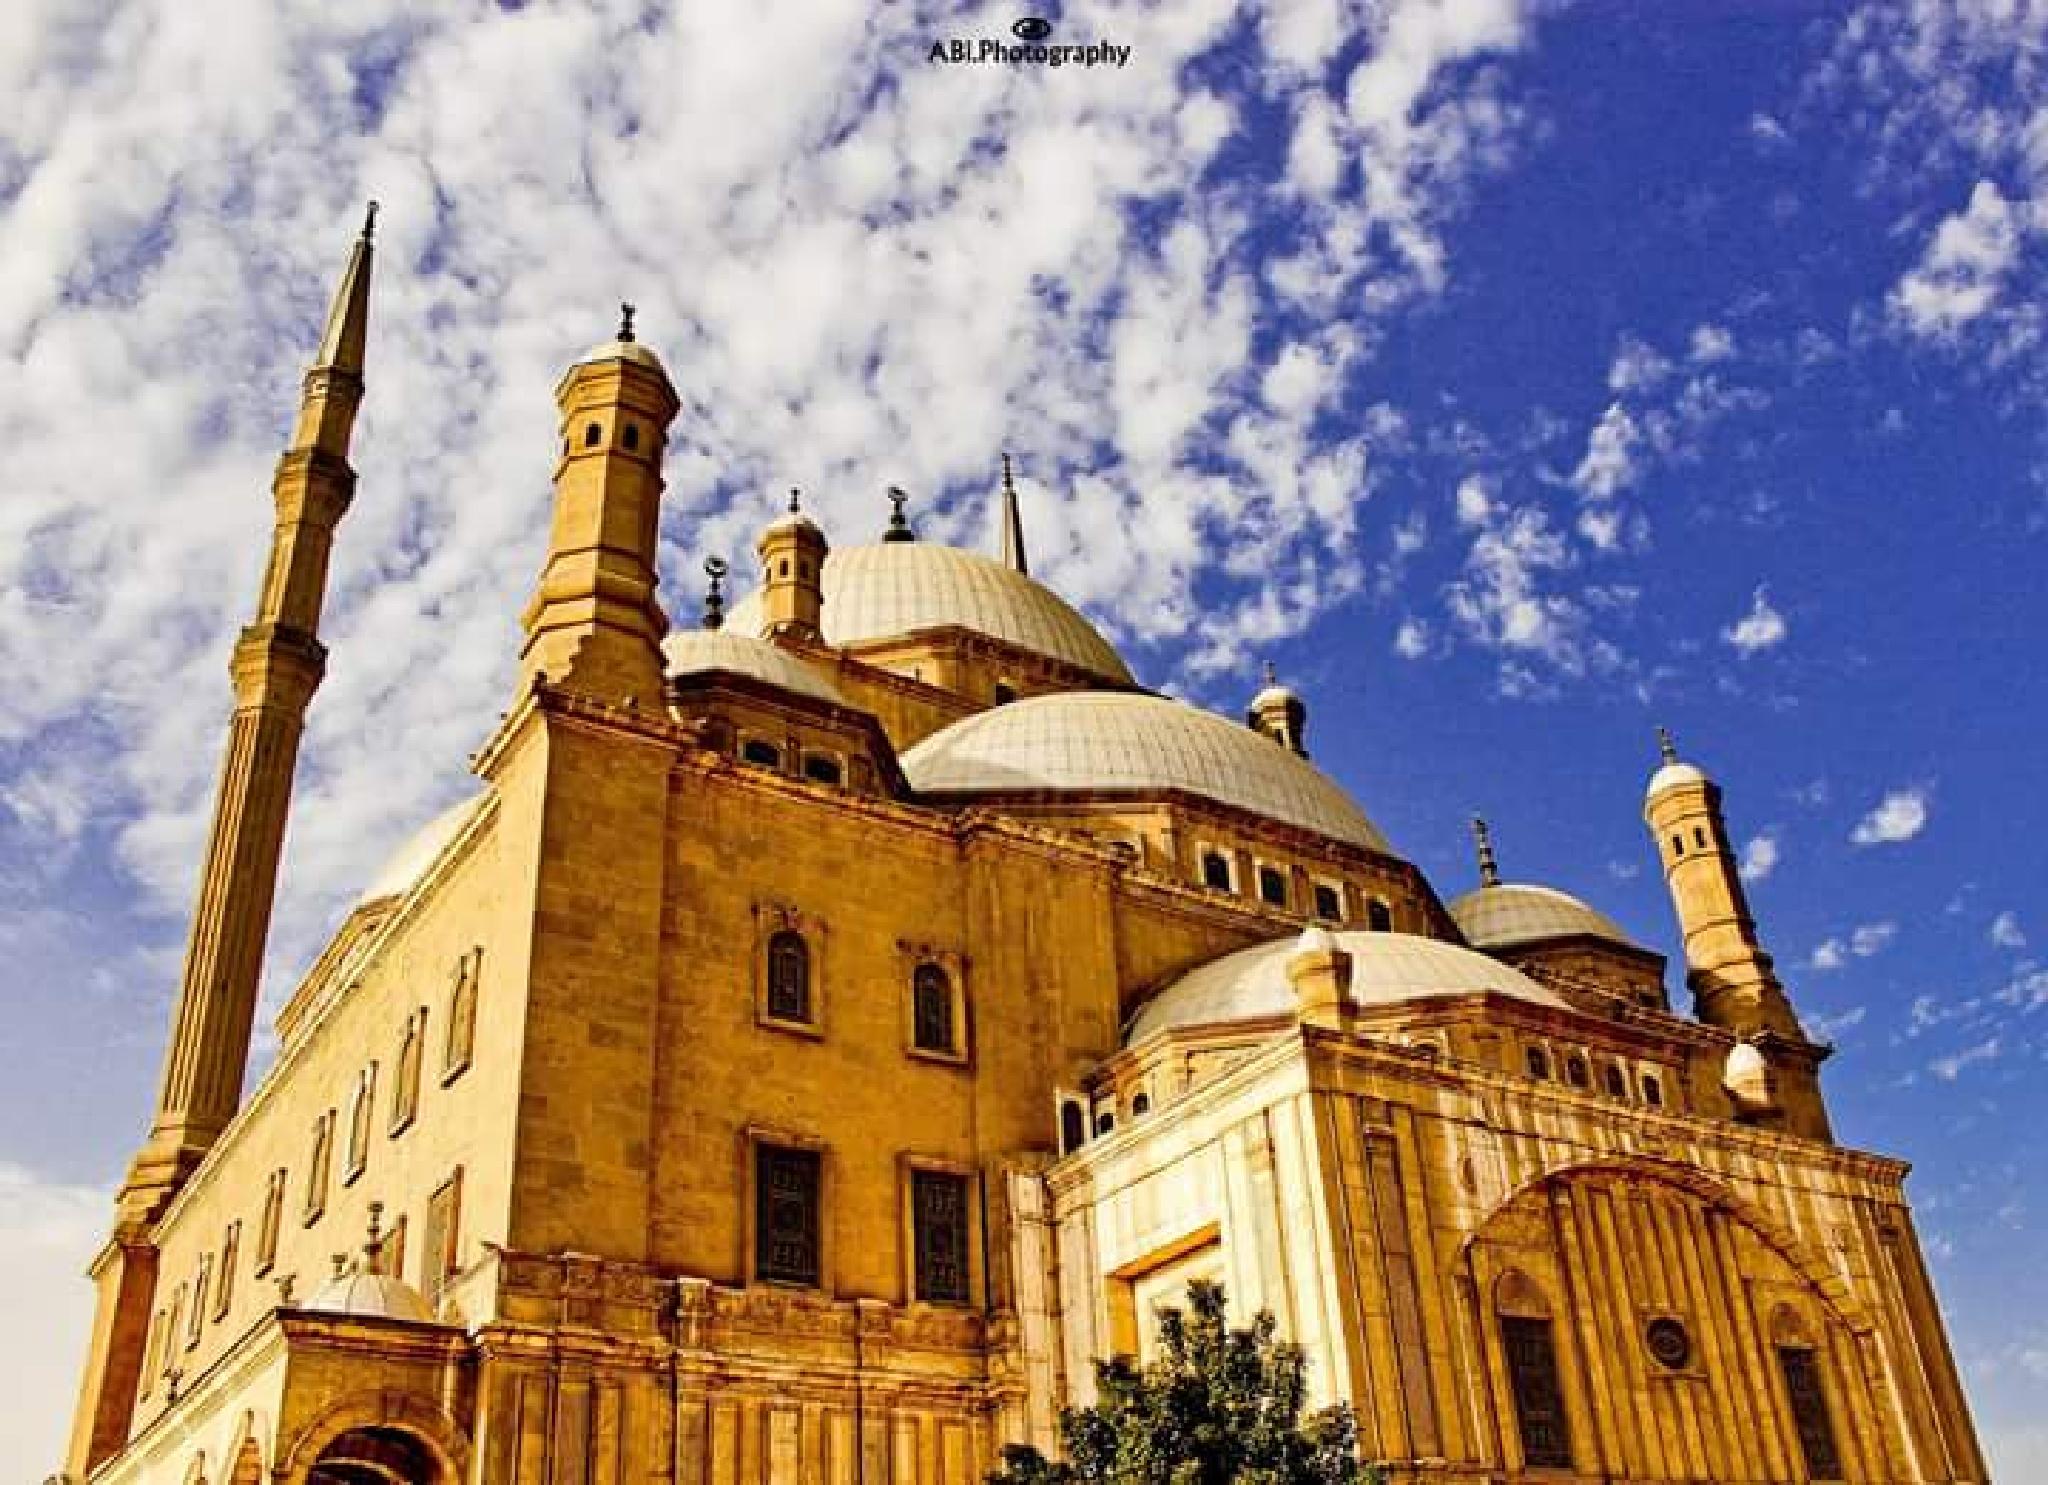 Here Cairo by Abi Kamel Abd Elrahman